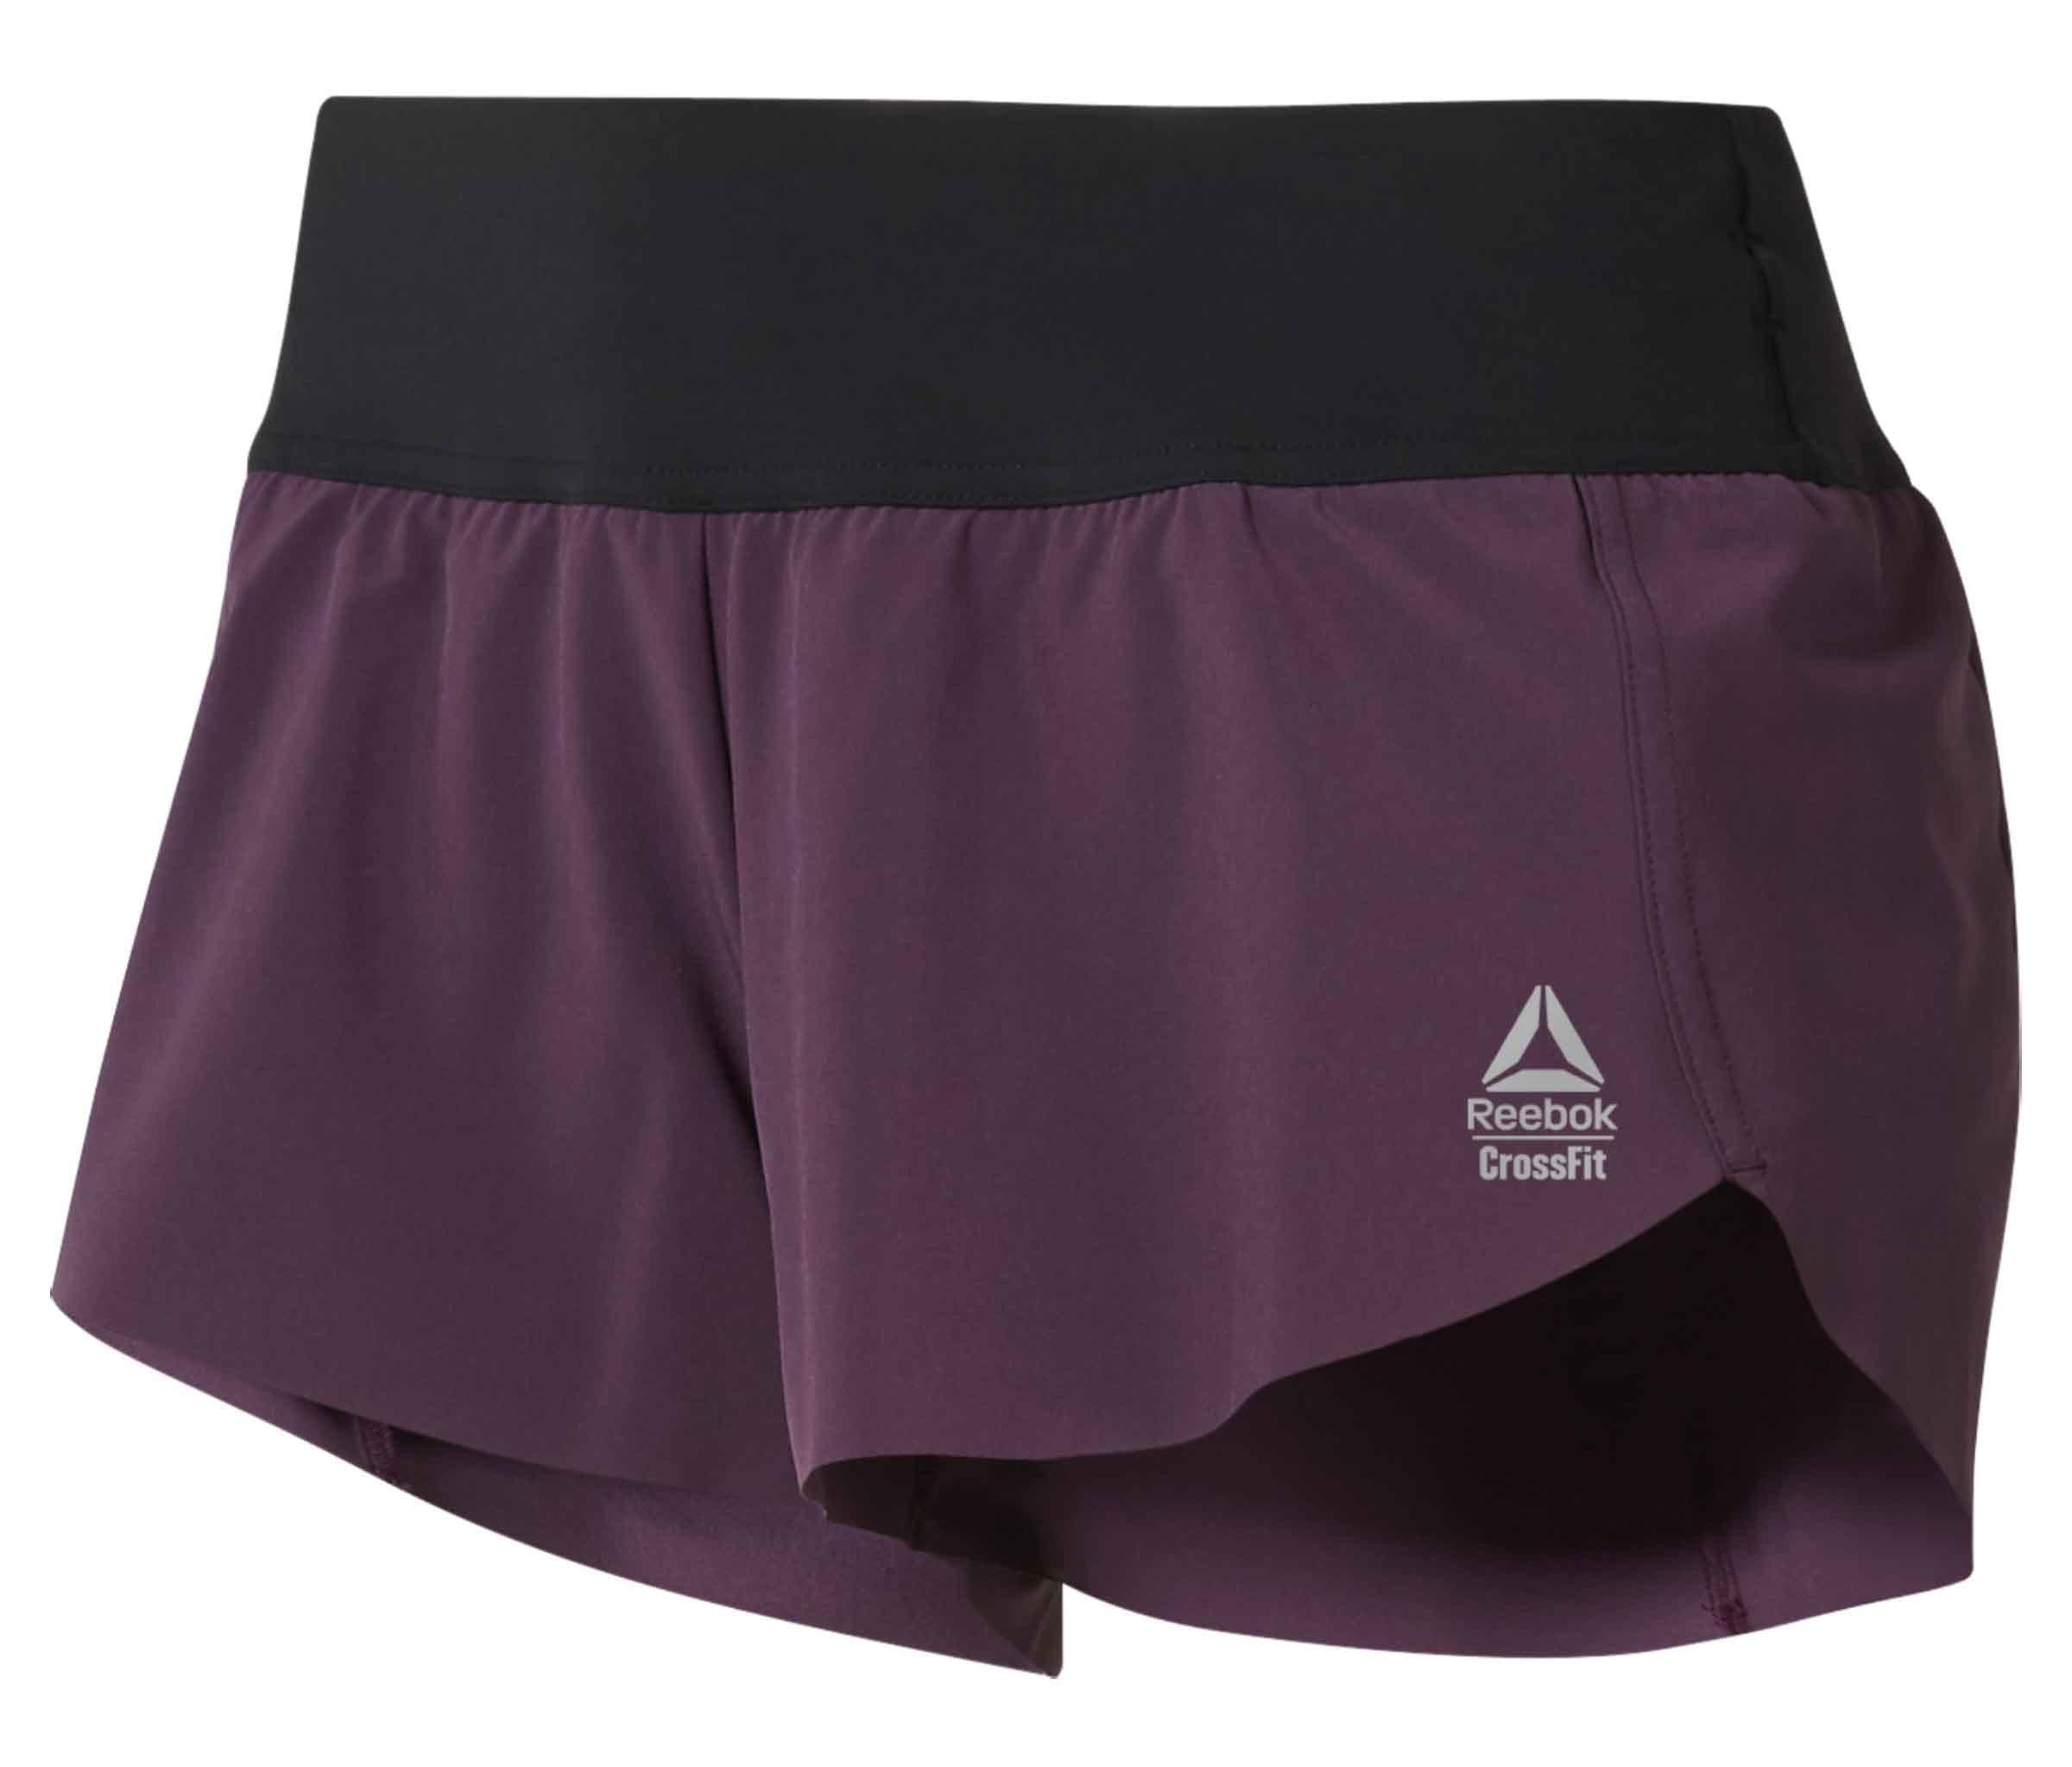 crossfit-shorts-knit-waistband